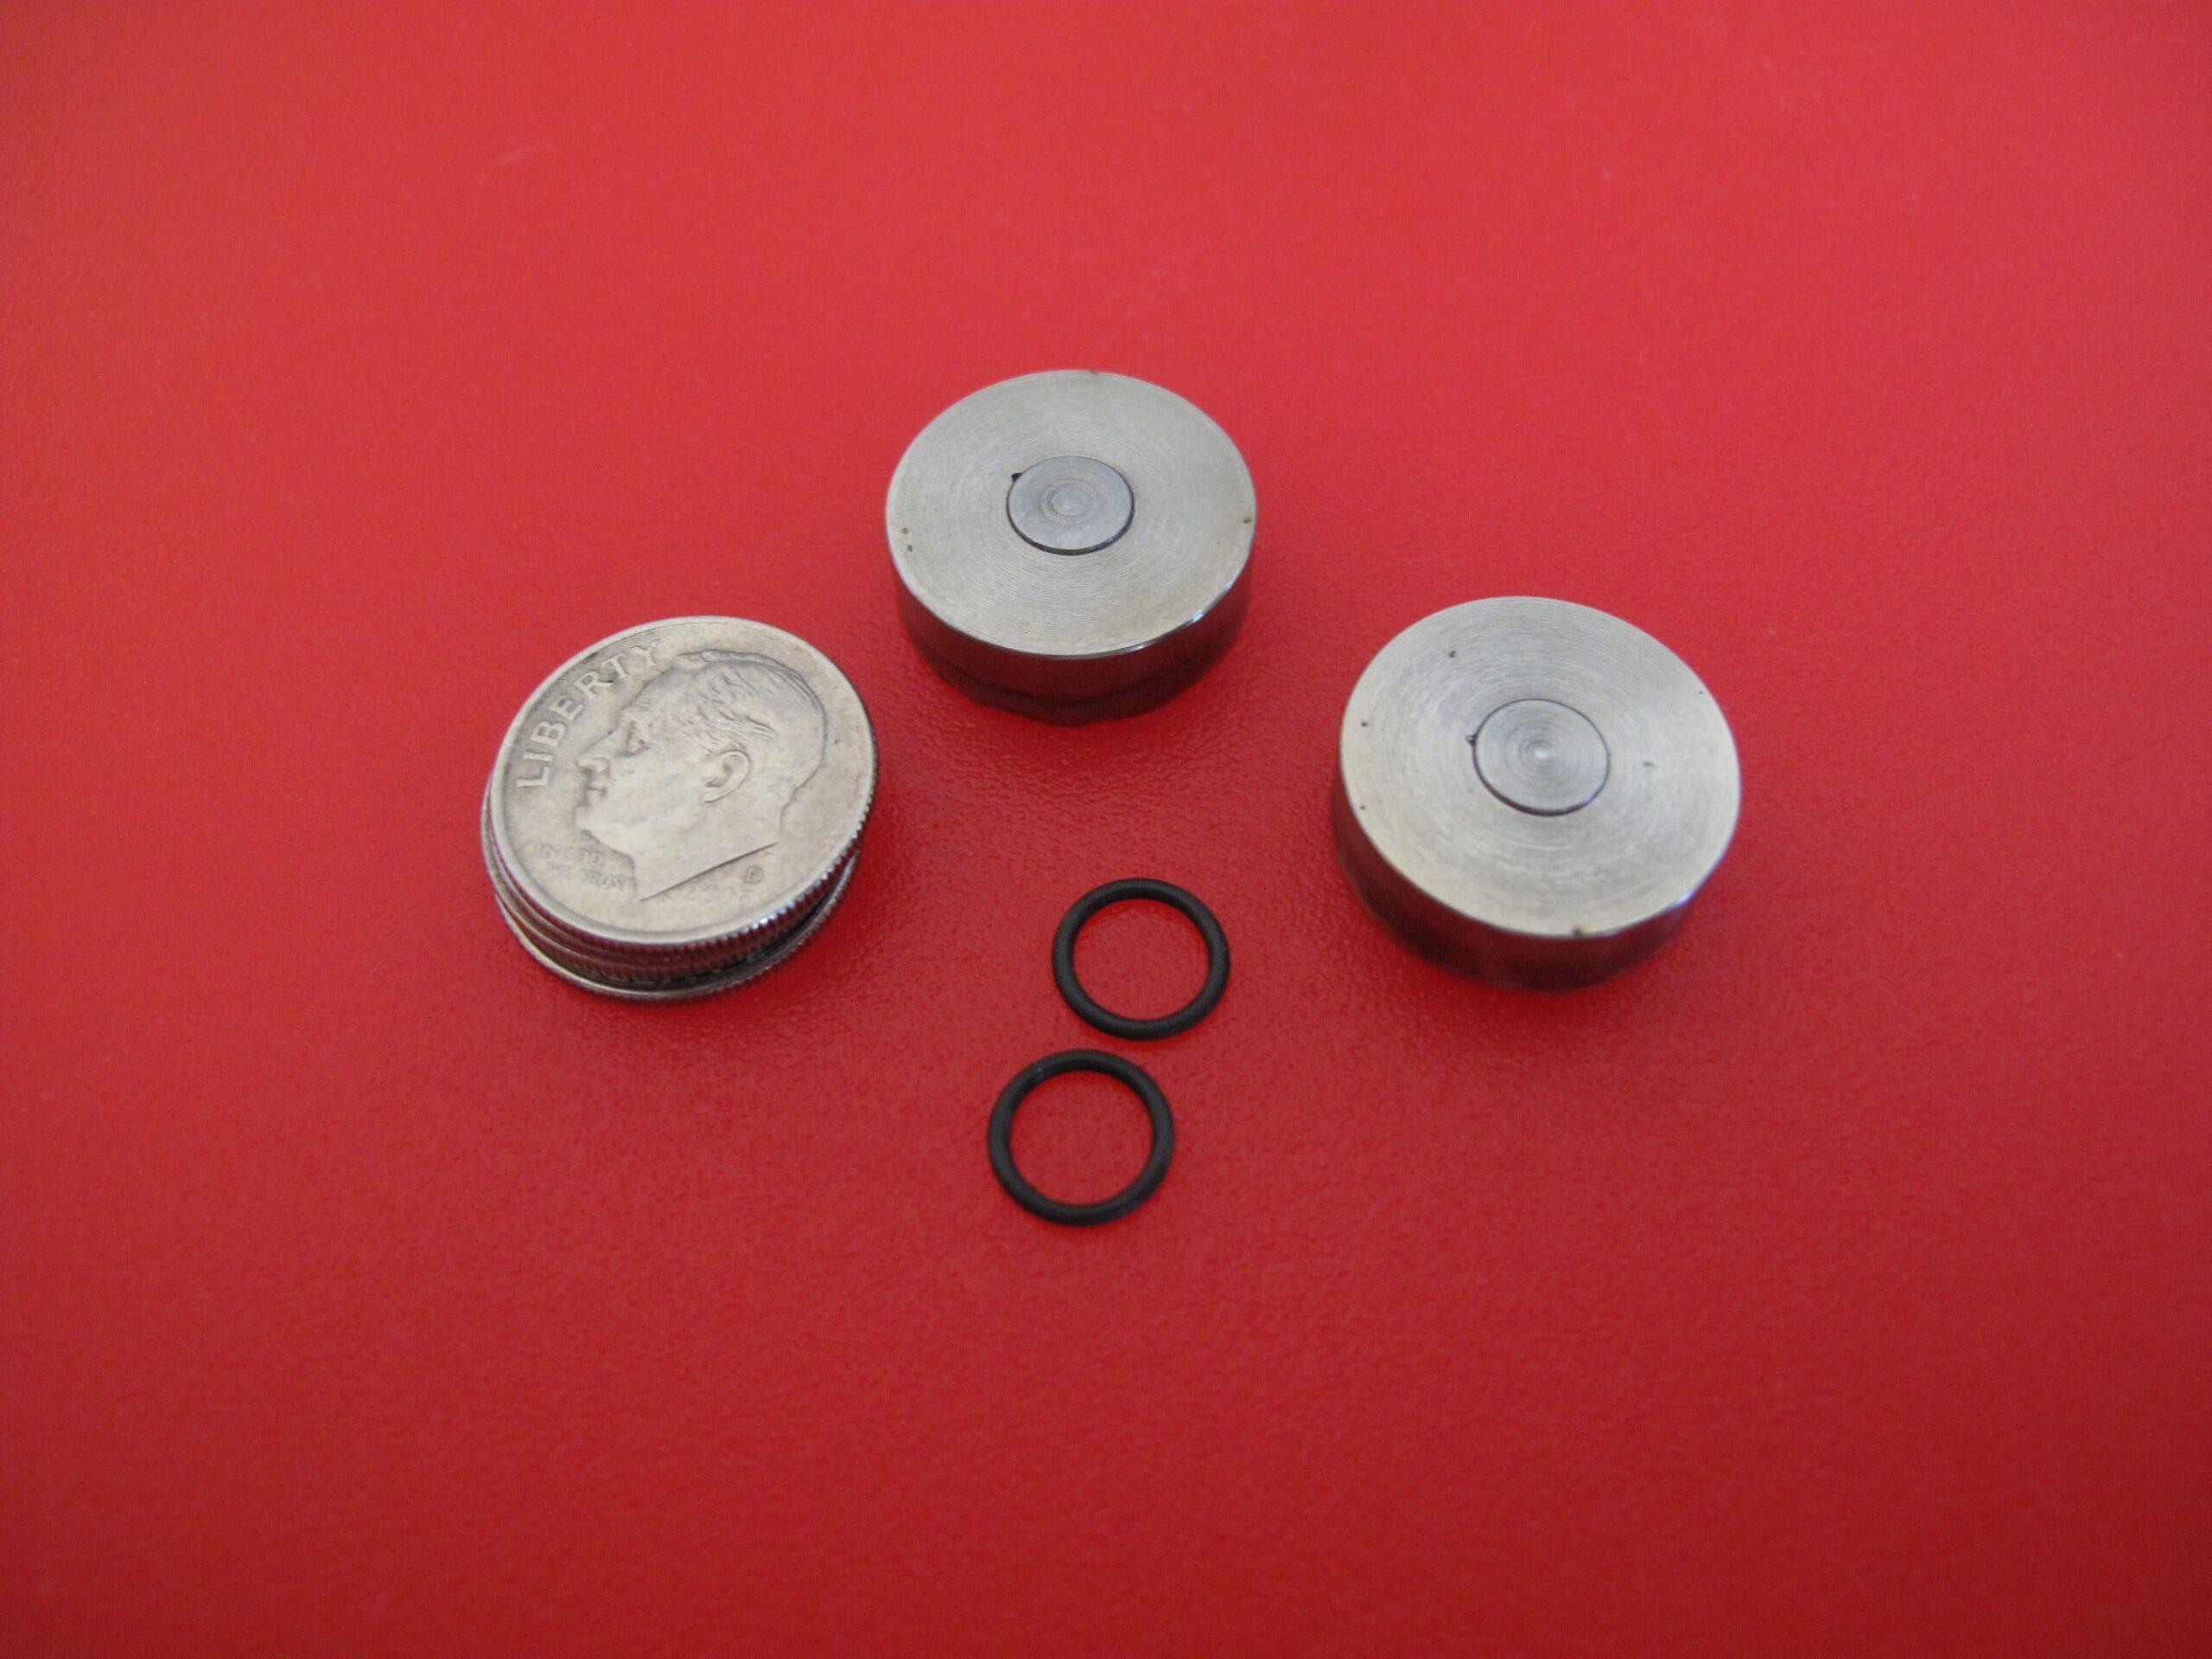 Wax Pillbox Actuator Testing & Characterization